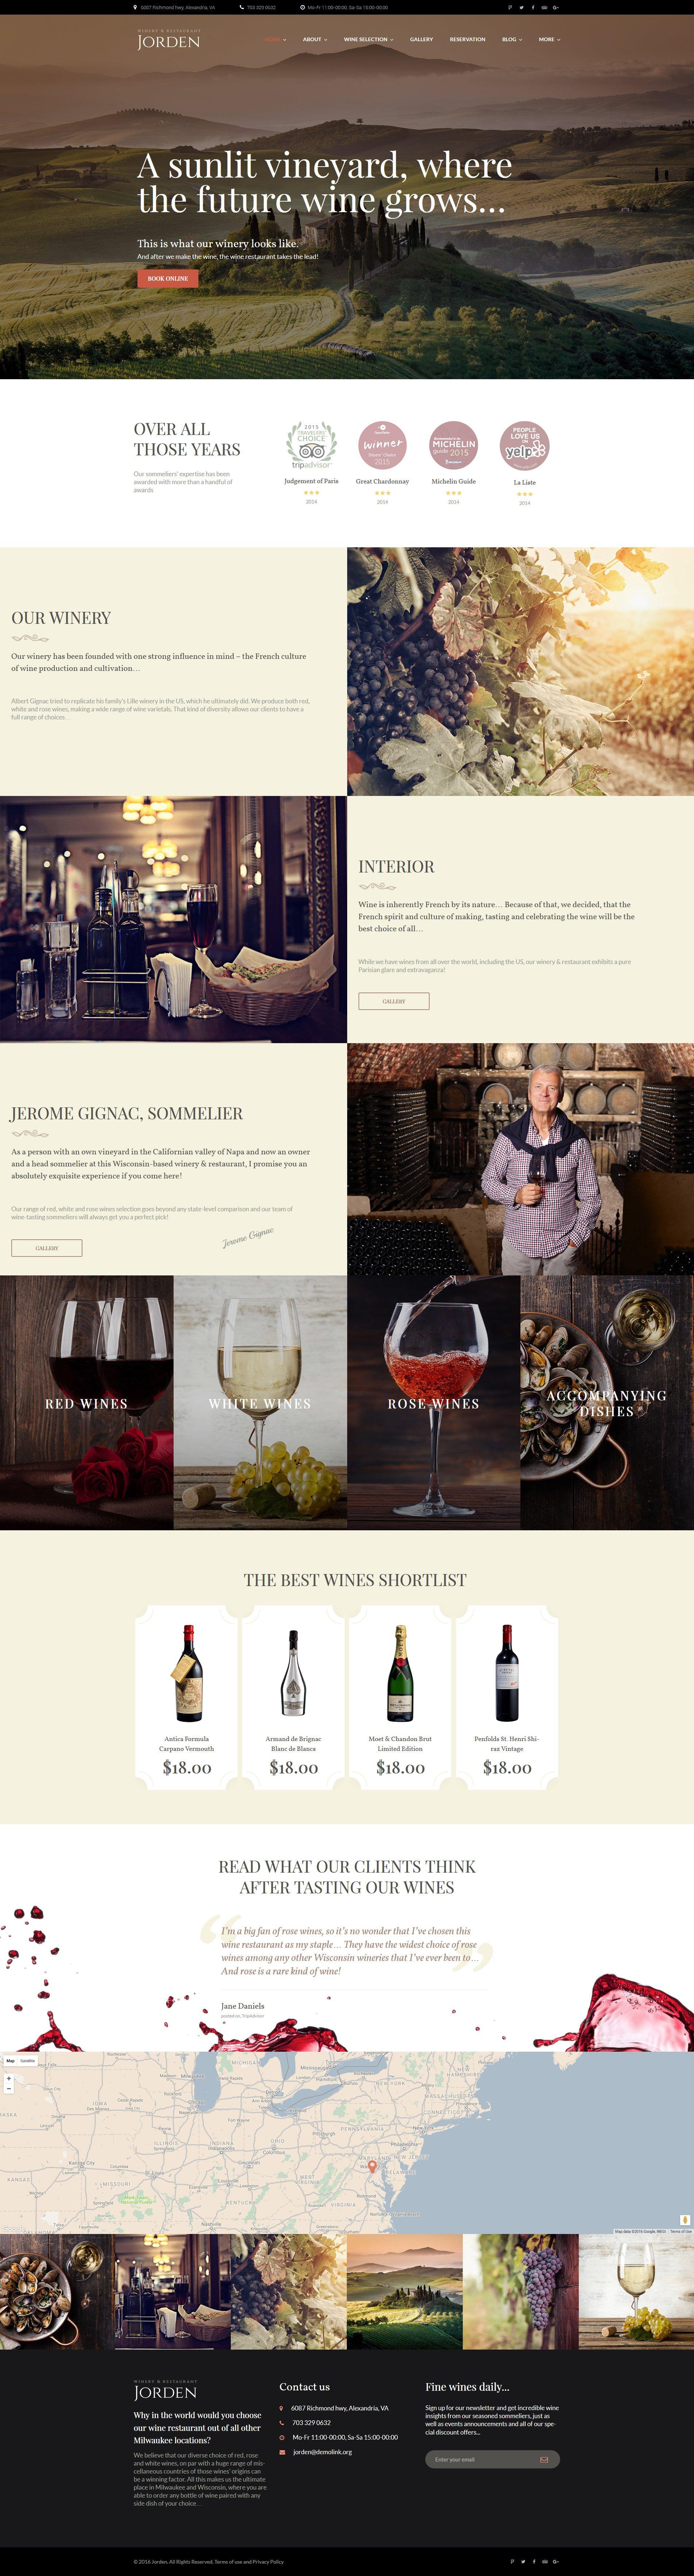 Jorden - Wine & Winery WordPress Theme - screenshot